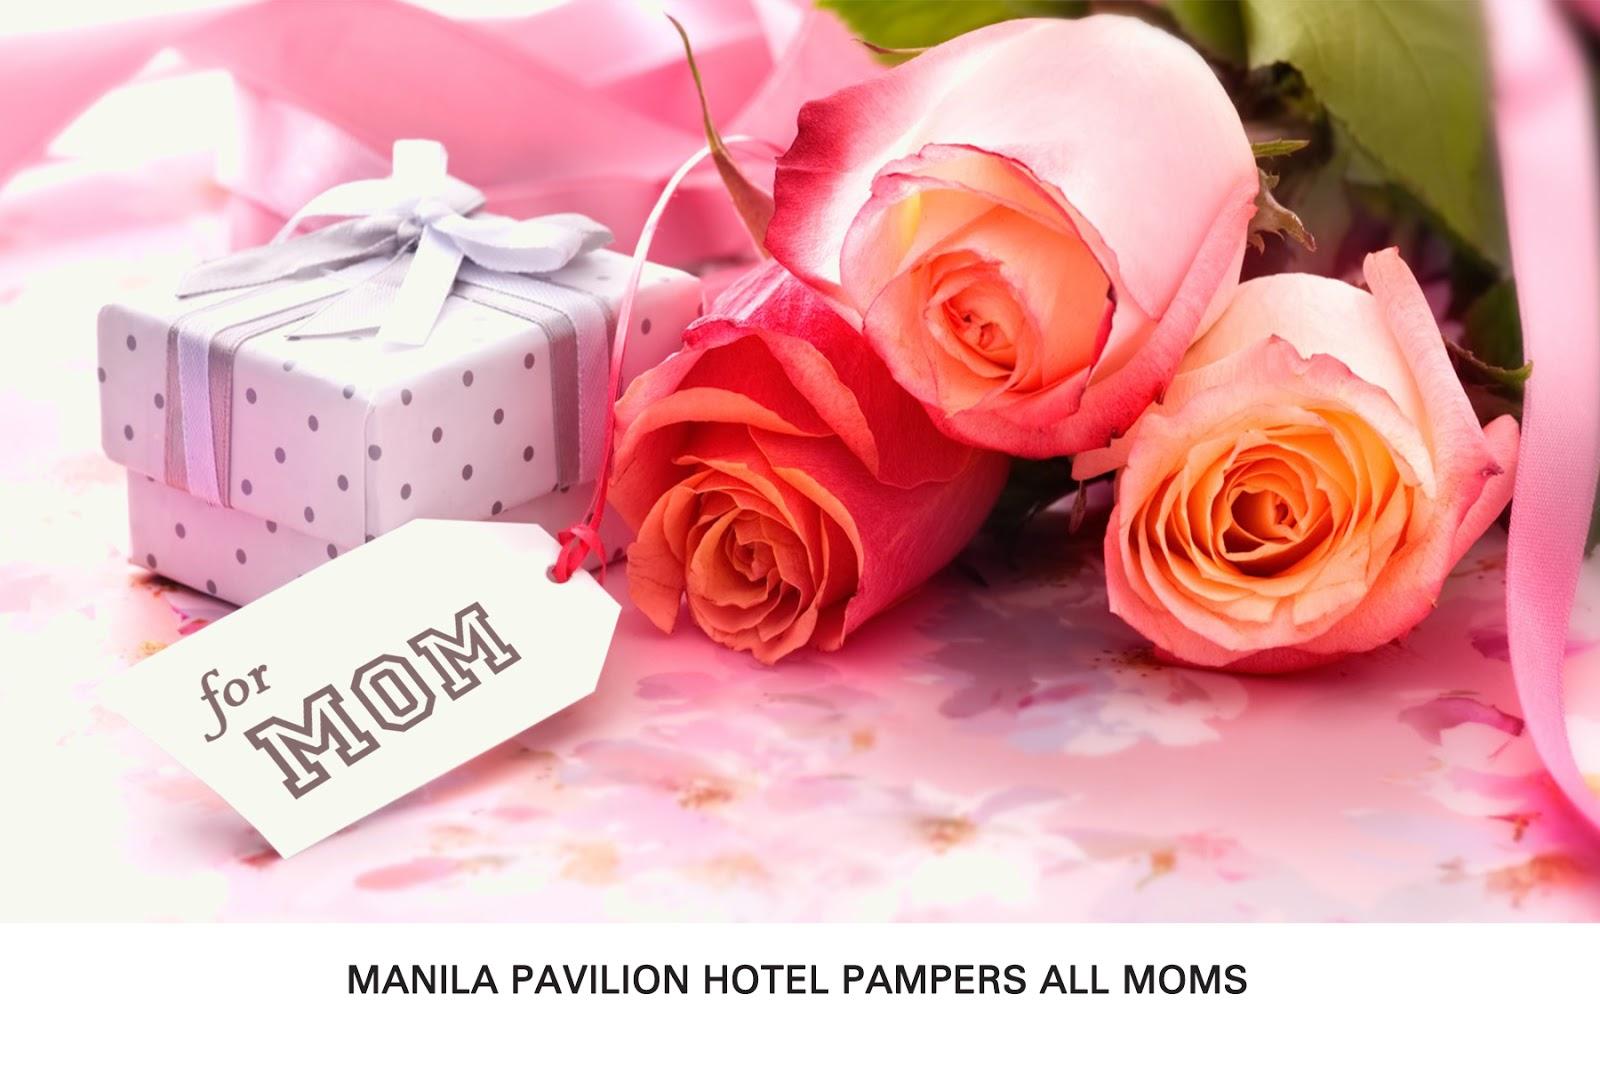 © TheMermaidinStilettos.com - Manila Pavilion Mother's Day 2016